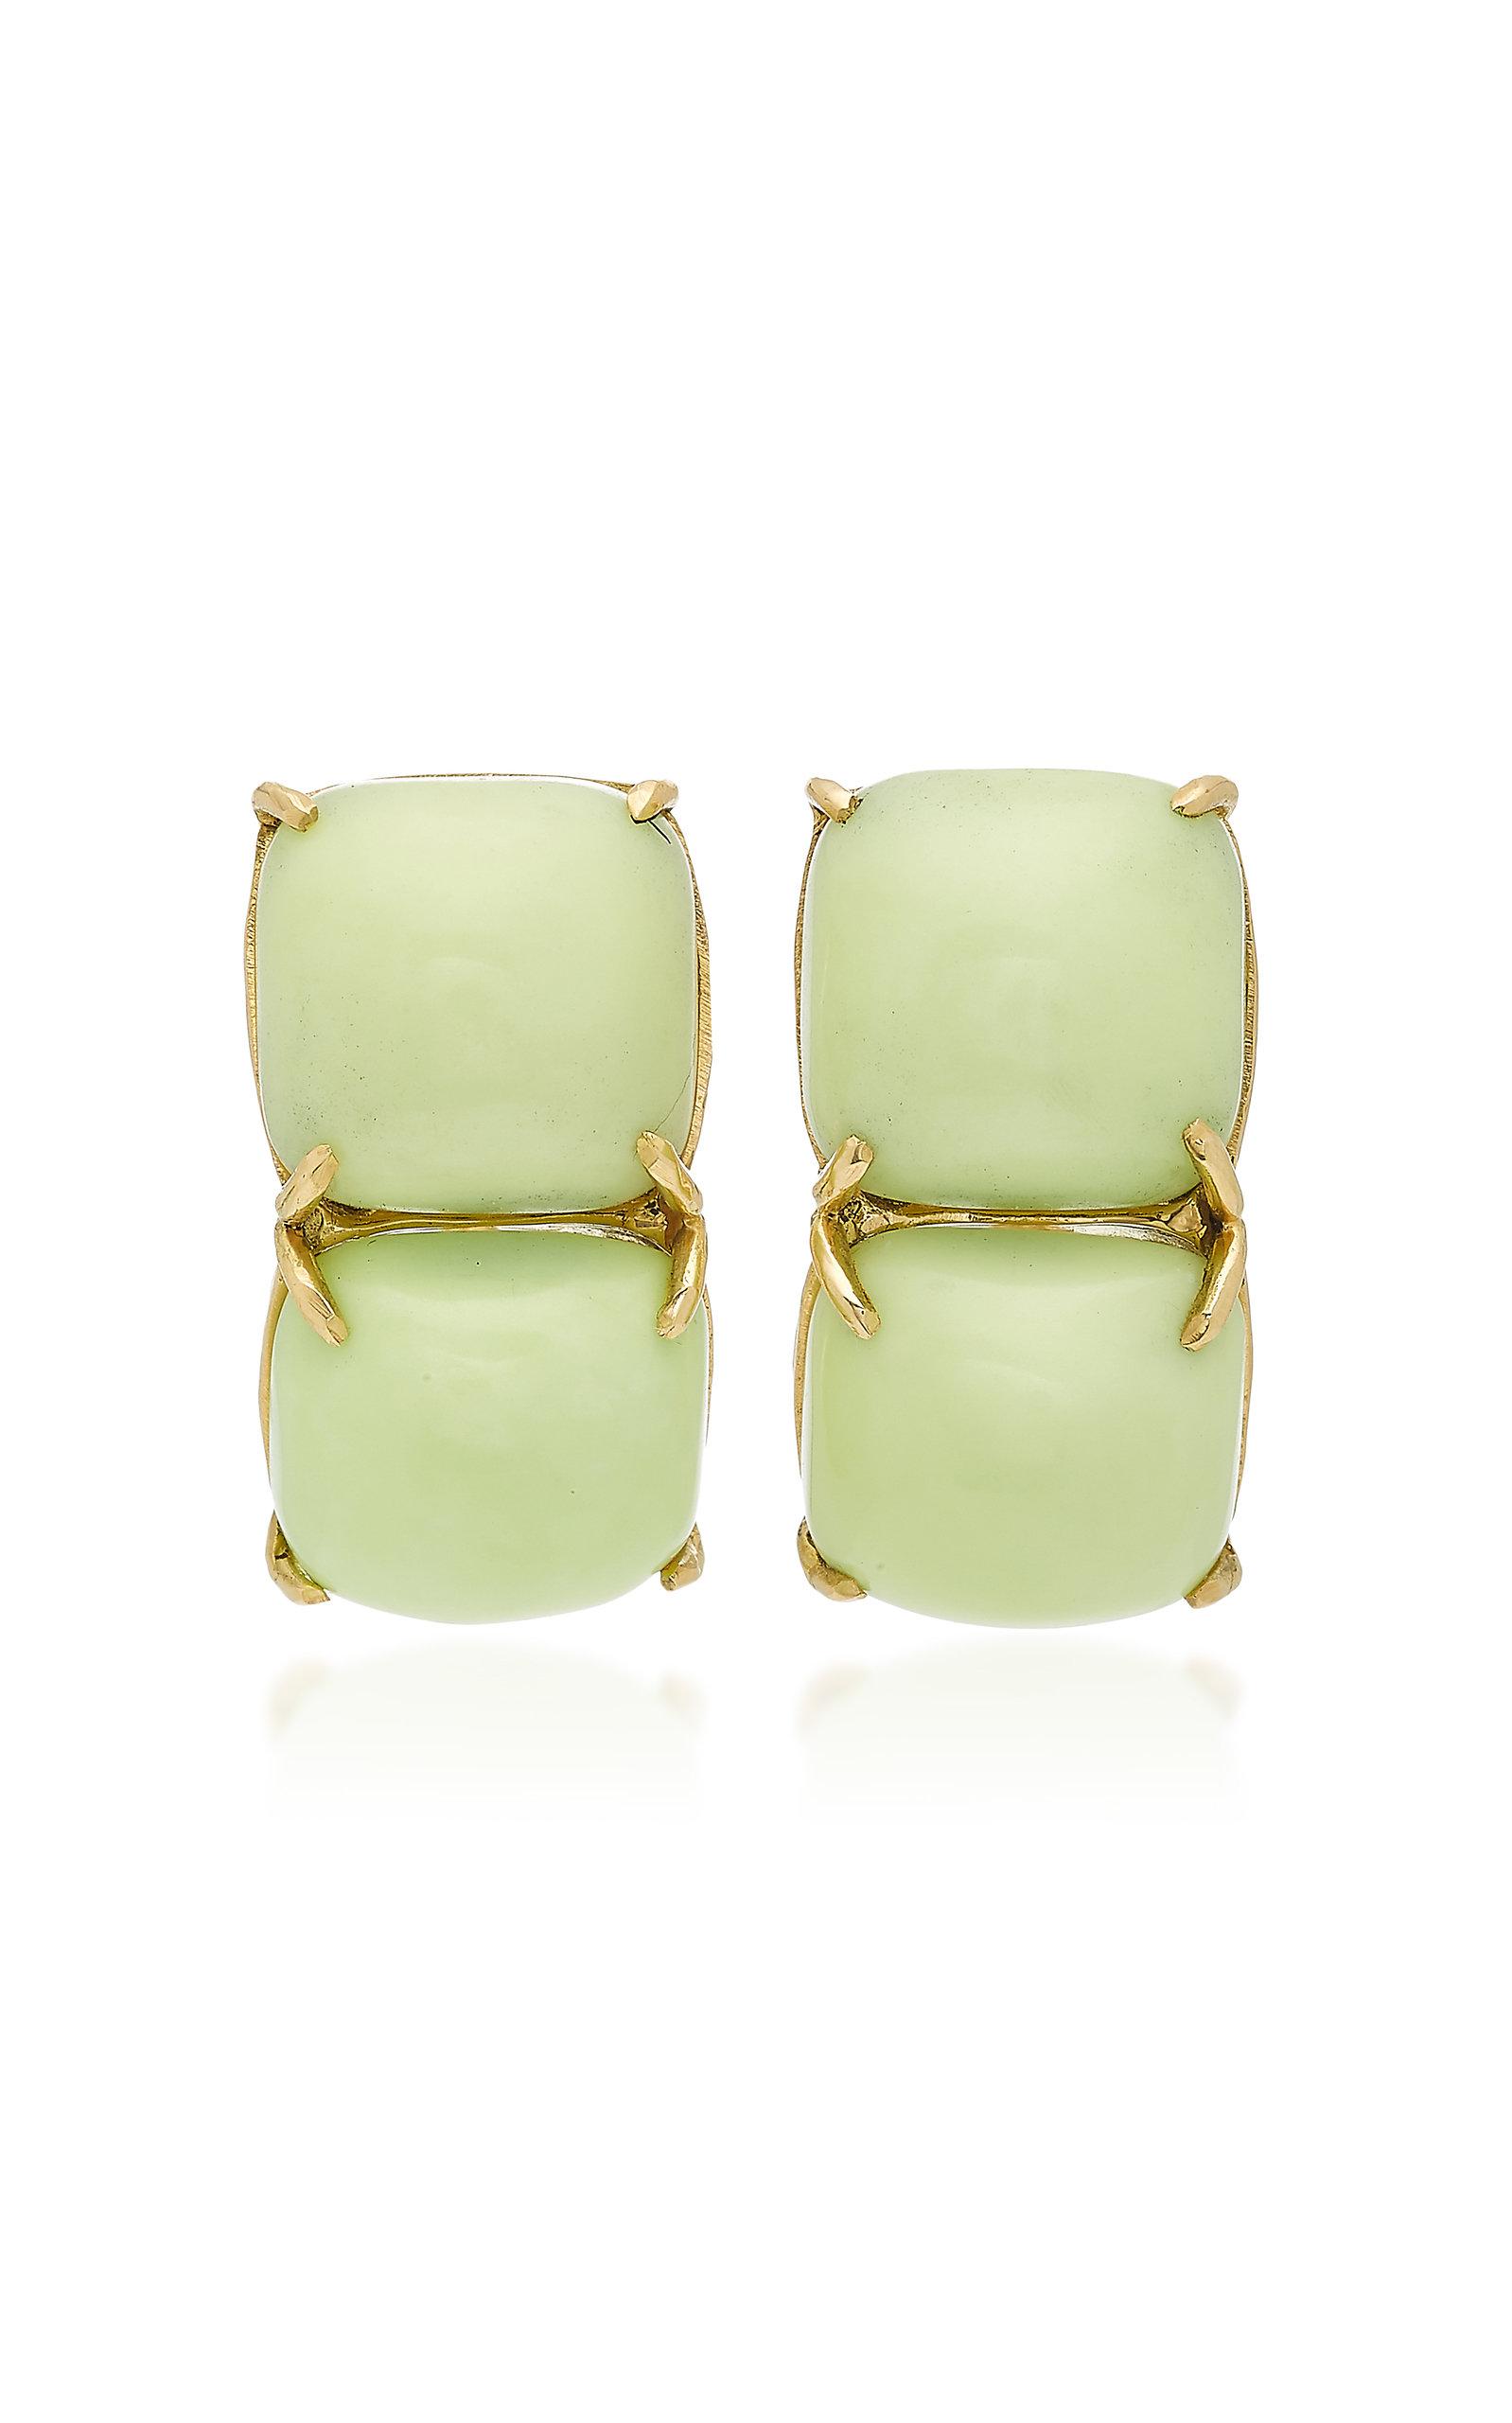 SORAB & ROSHI 18K Gold Crysophase Clip Earrings in Green